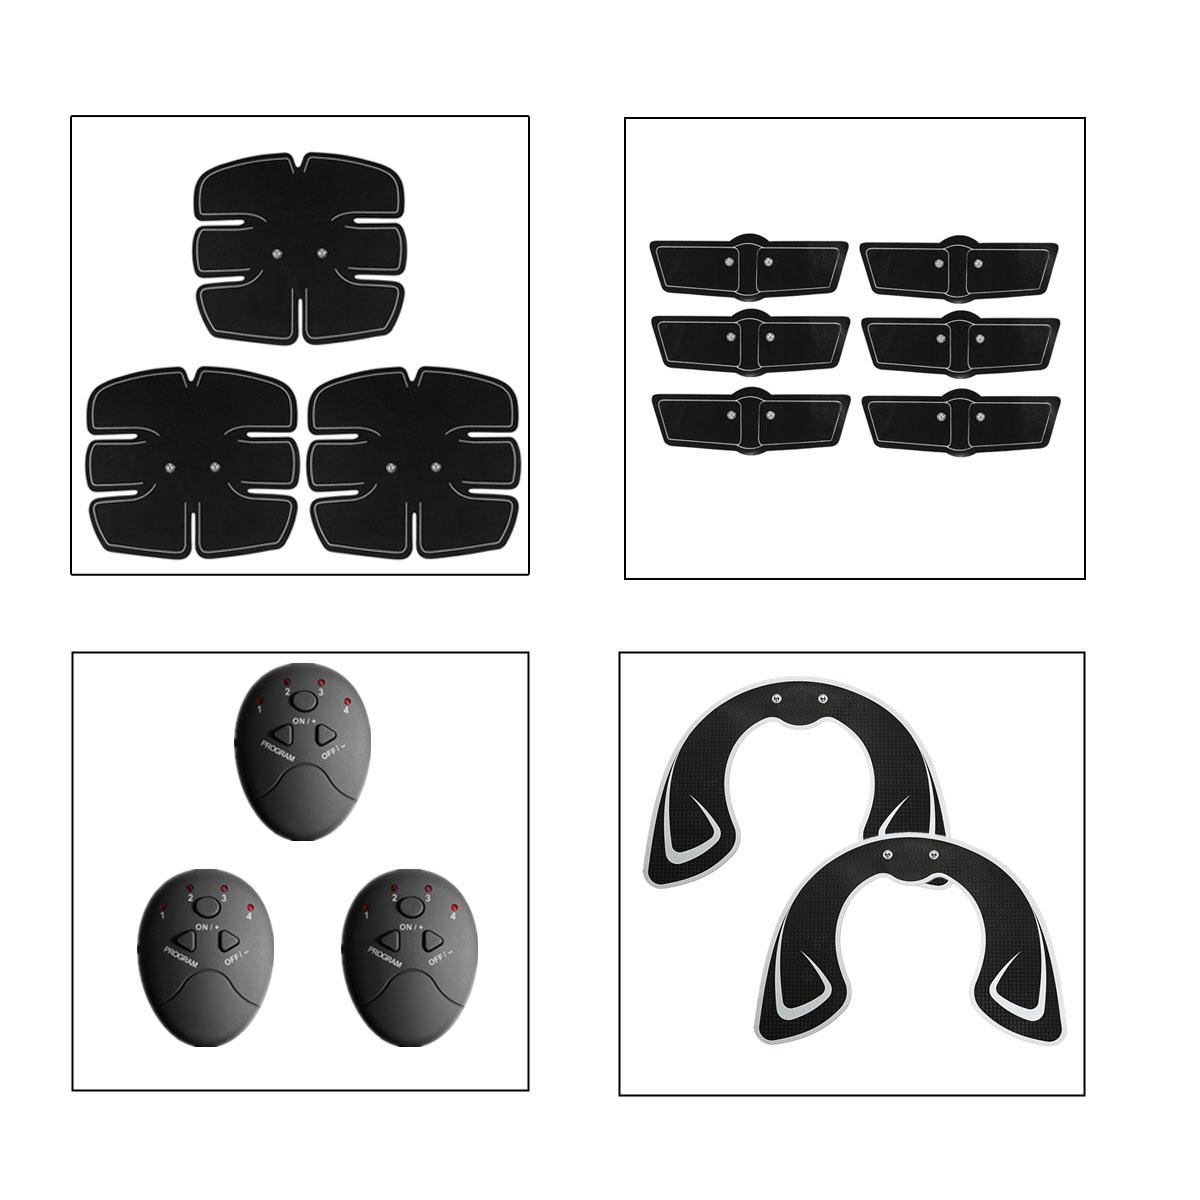 KALOAD 32PCS Arm Abdominal Muscle Trainer Hip Trainer Body Beauty Stimulator